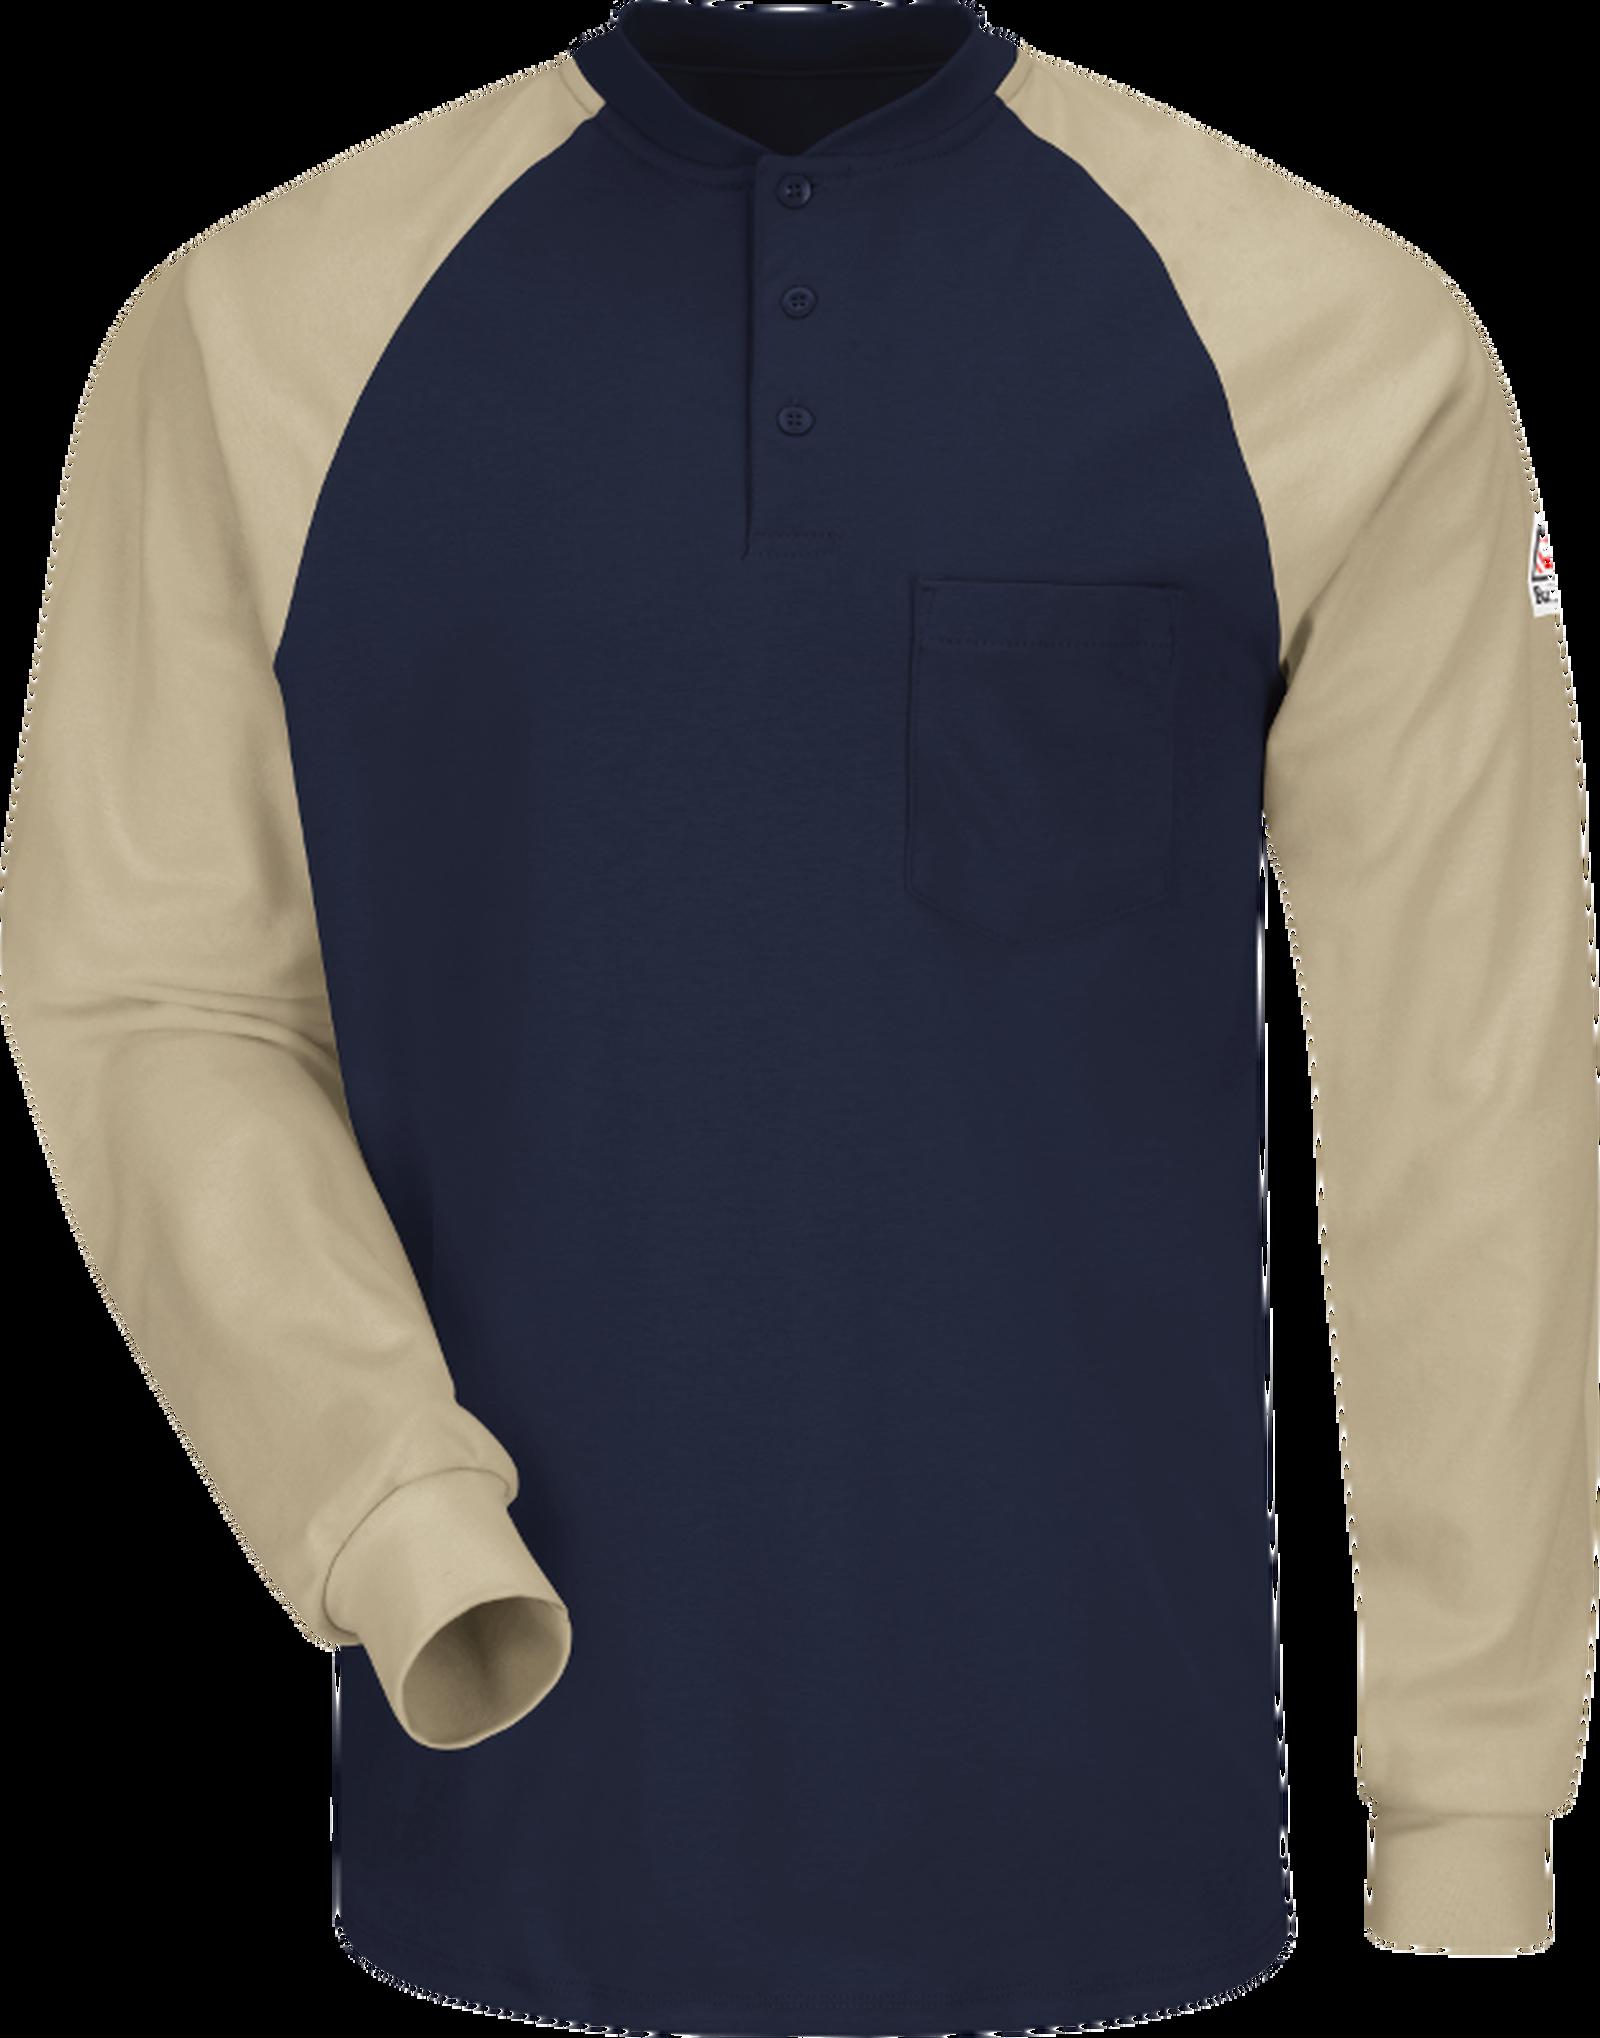 Men's Lightweight FR Colorblock Tagless Henley